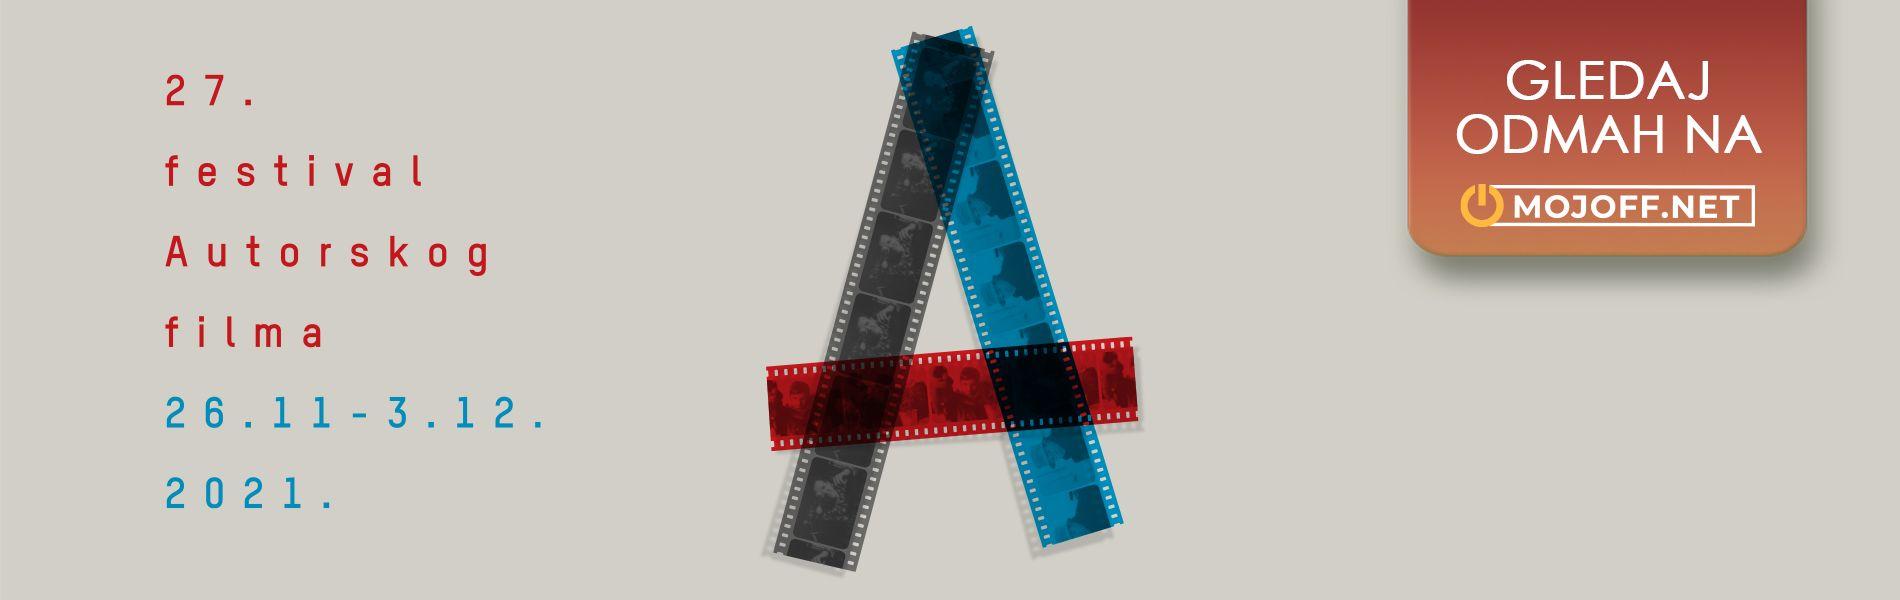 Festival autorskog filma